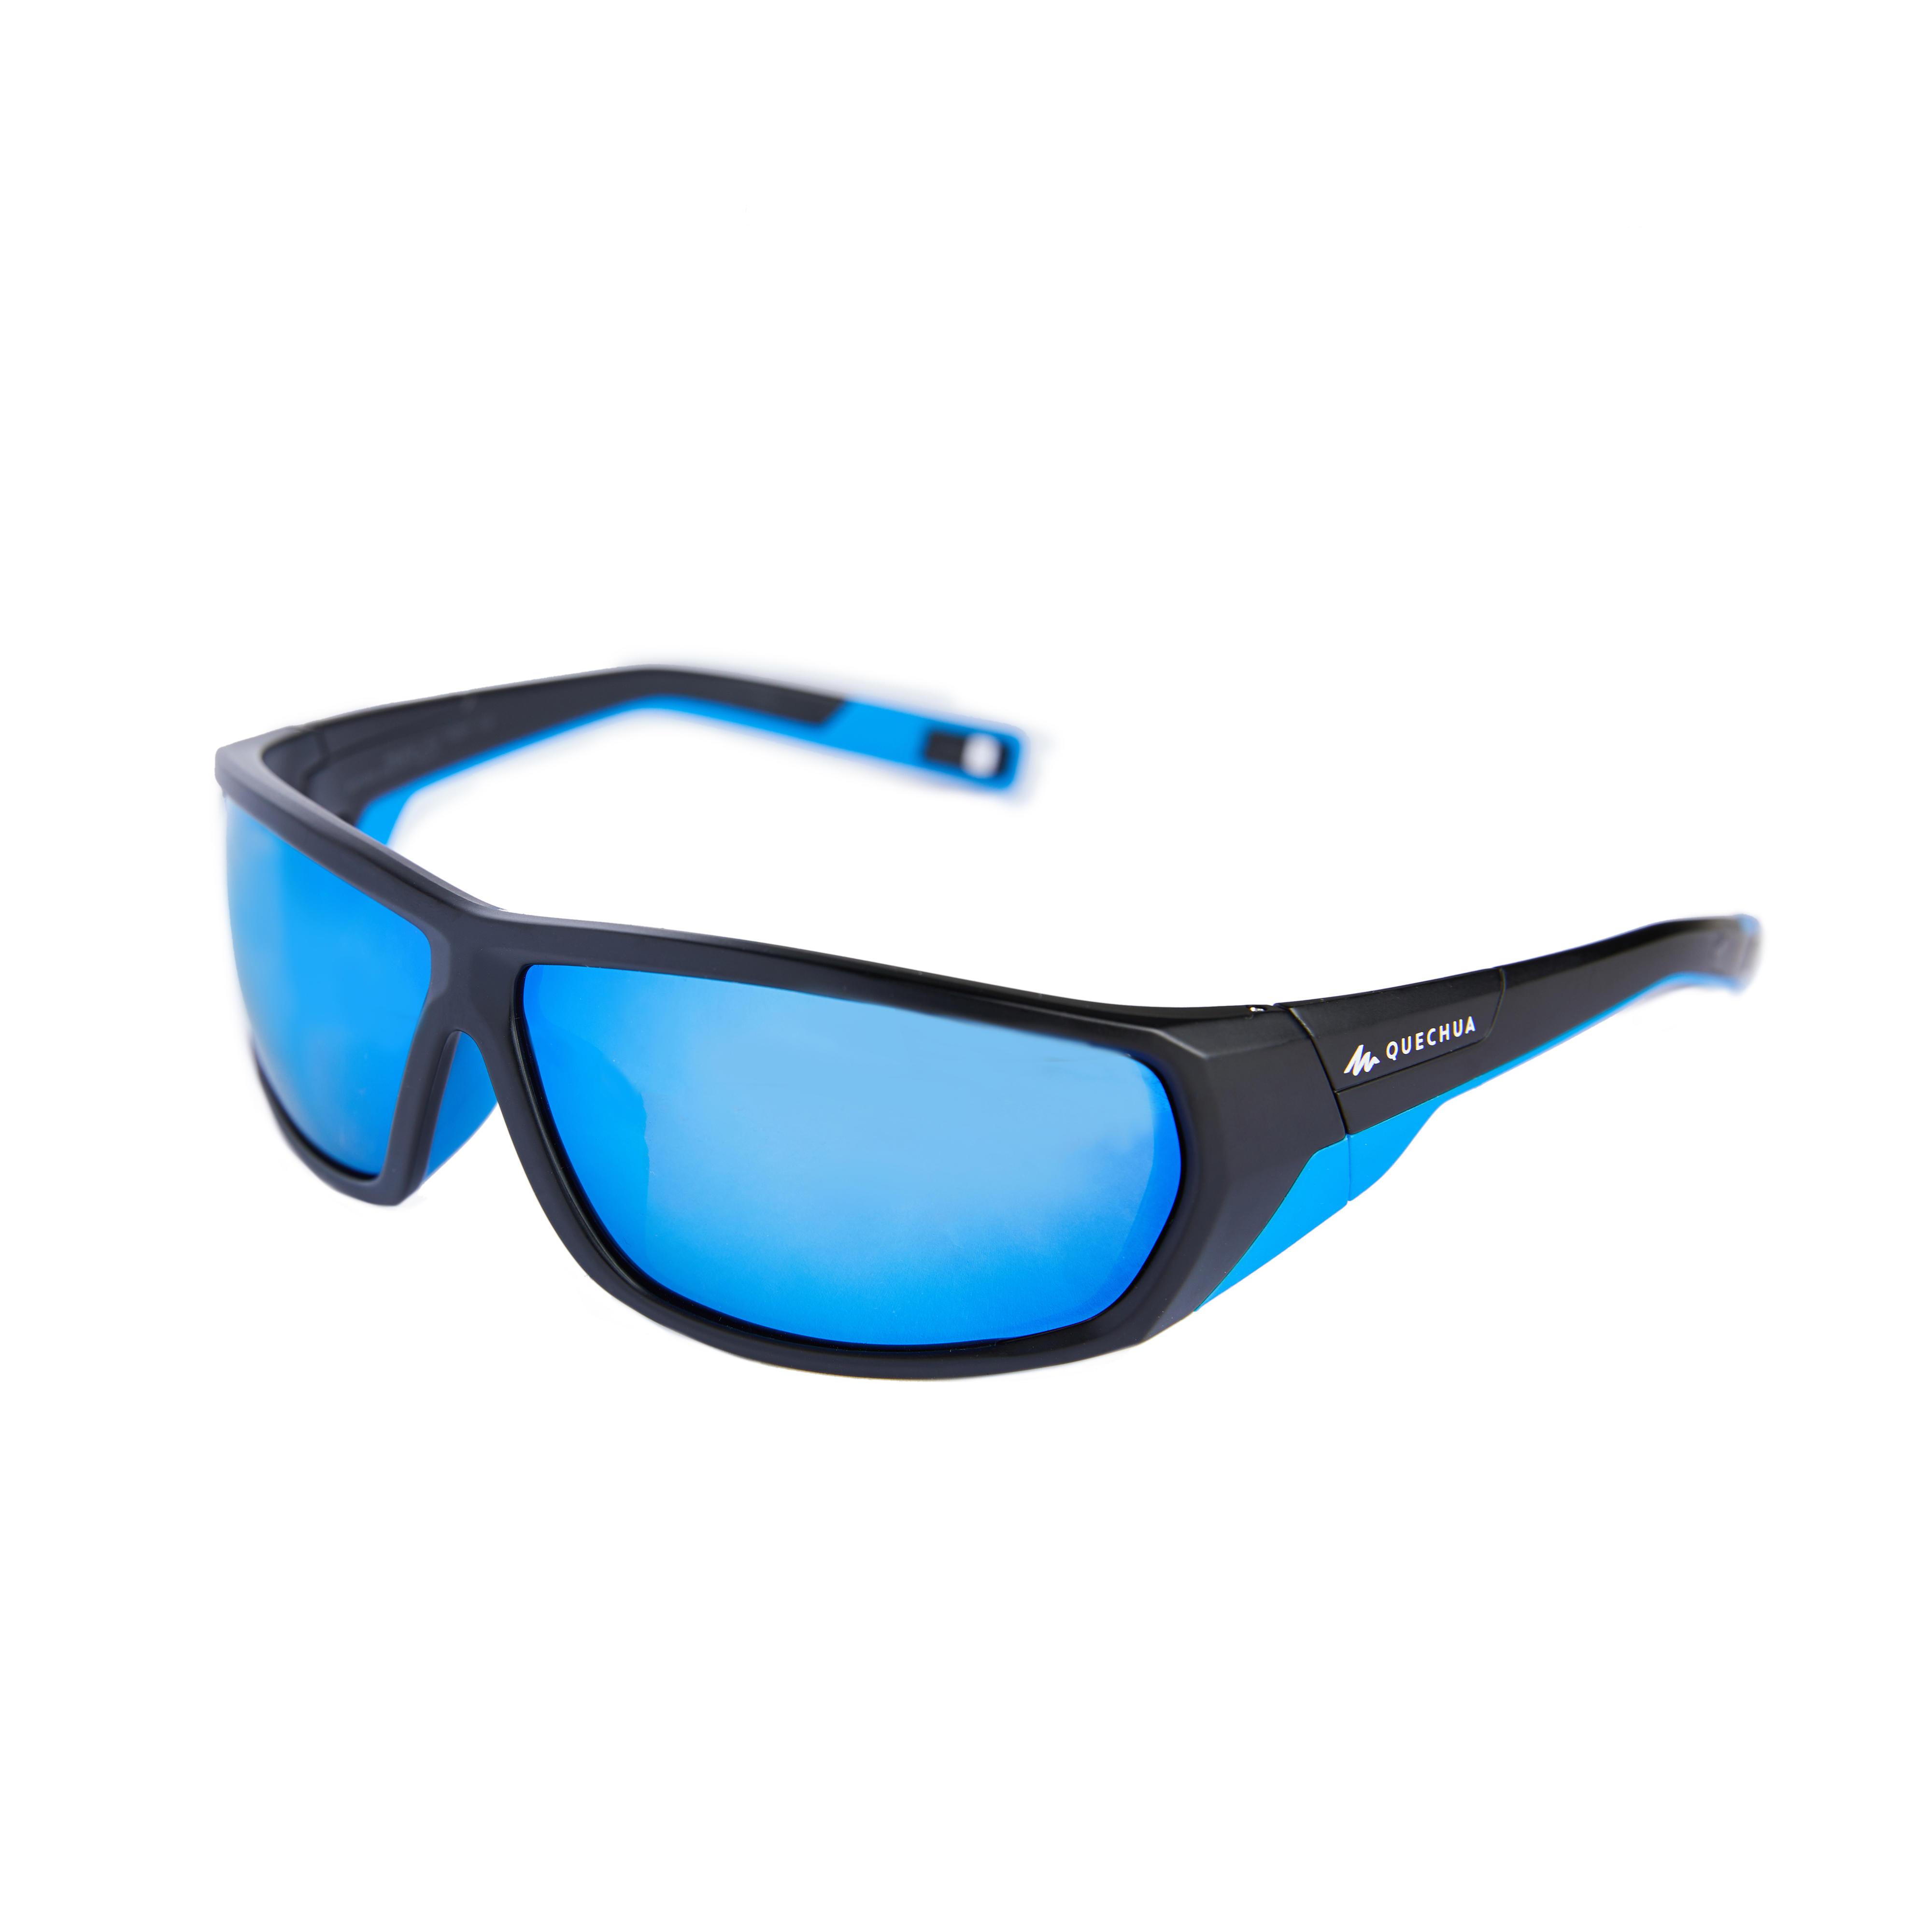 N-Specs Axel 3000 Polarized Lens Safety Glasses Each